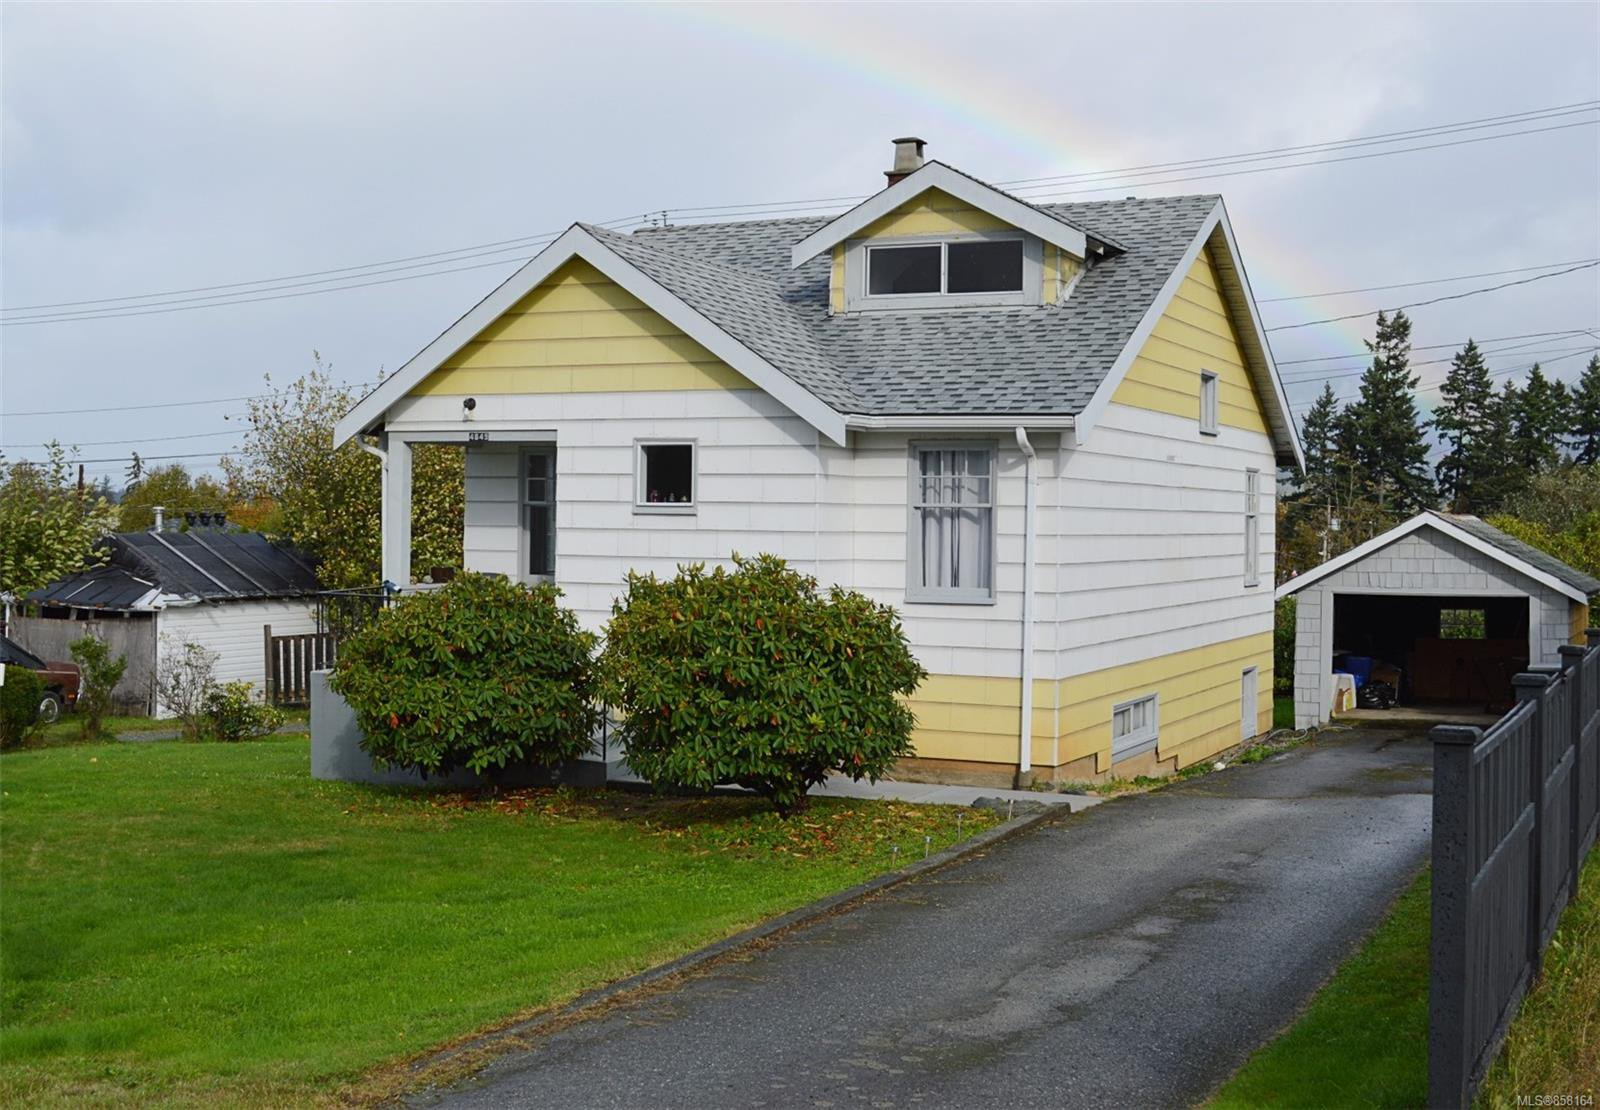 Main Photo: 4849 Morton St in : PA Port Alberni House for sale (Port Alberni)  : MLS®# 858164